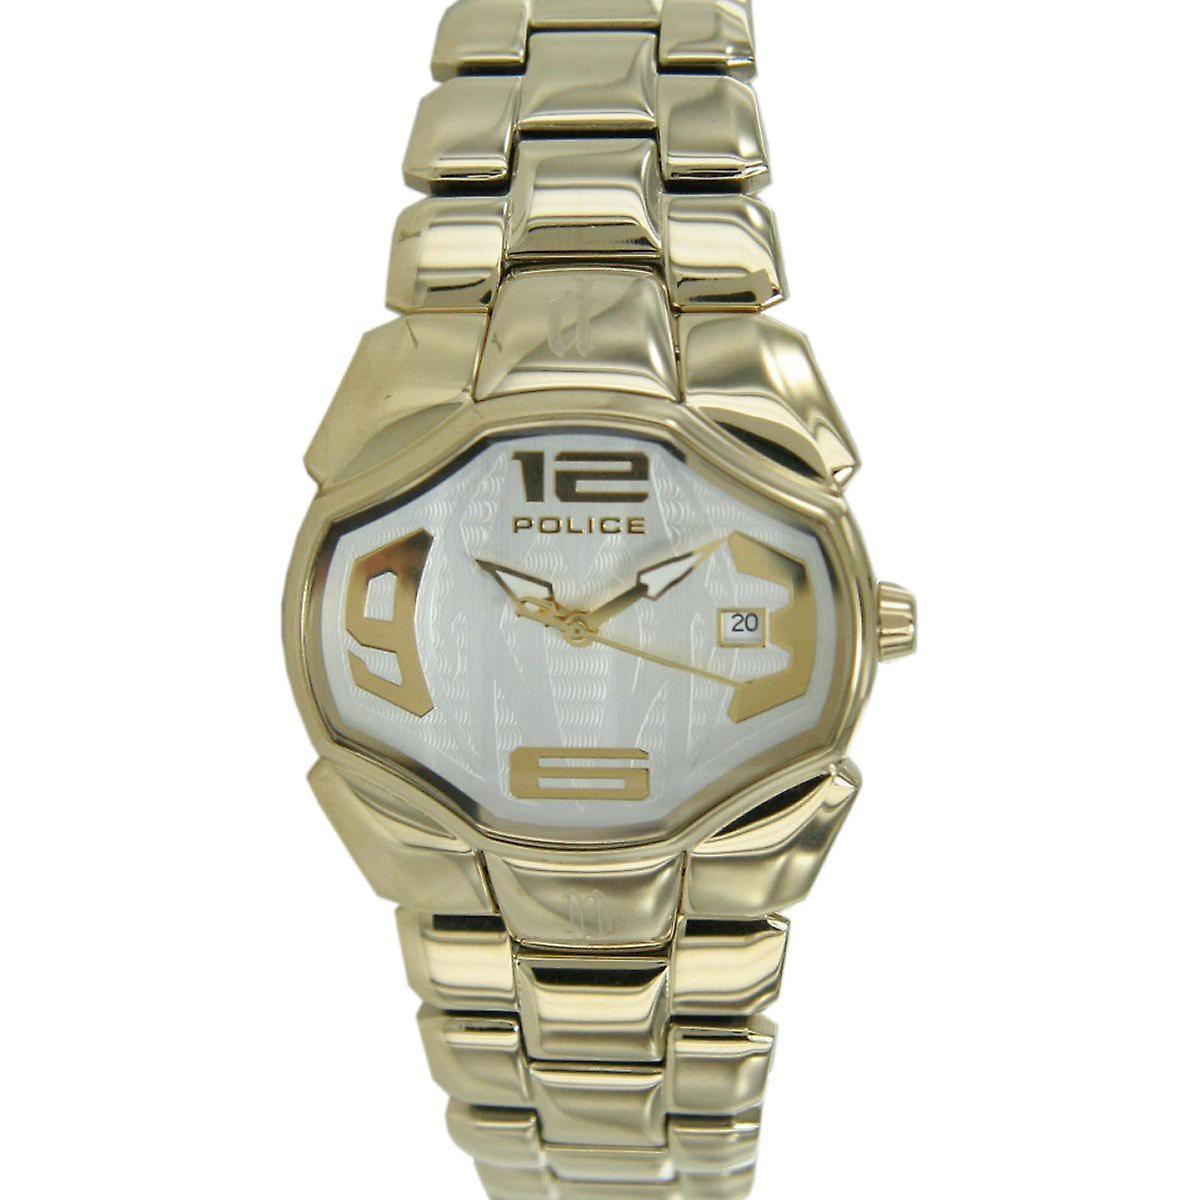 Police ladies watch wristwatch stainless steel gold Angel PL12896BSG / 04 M